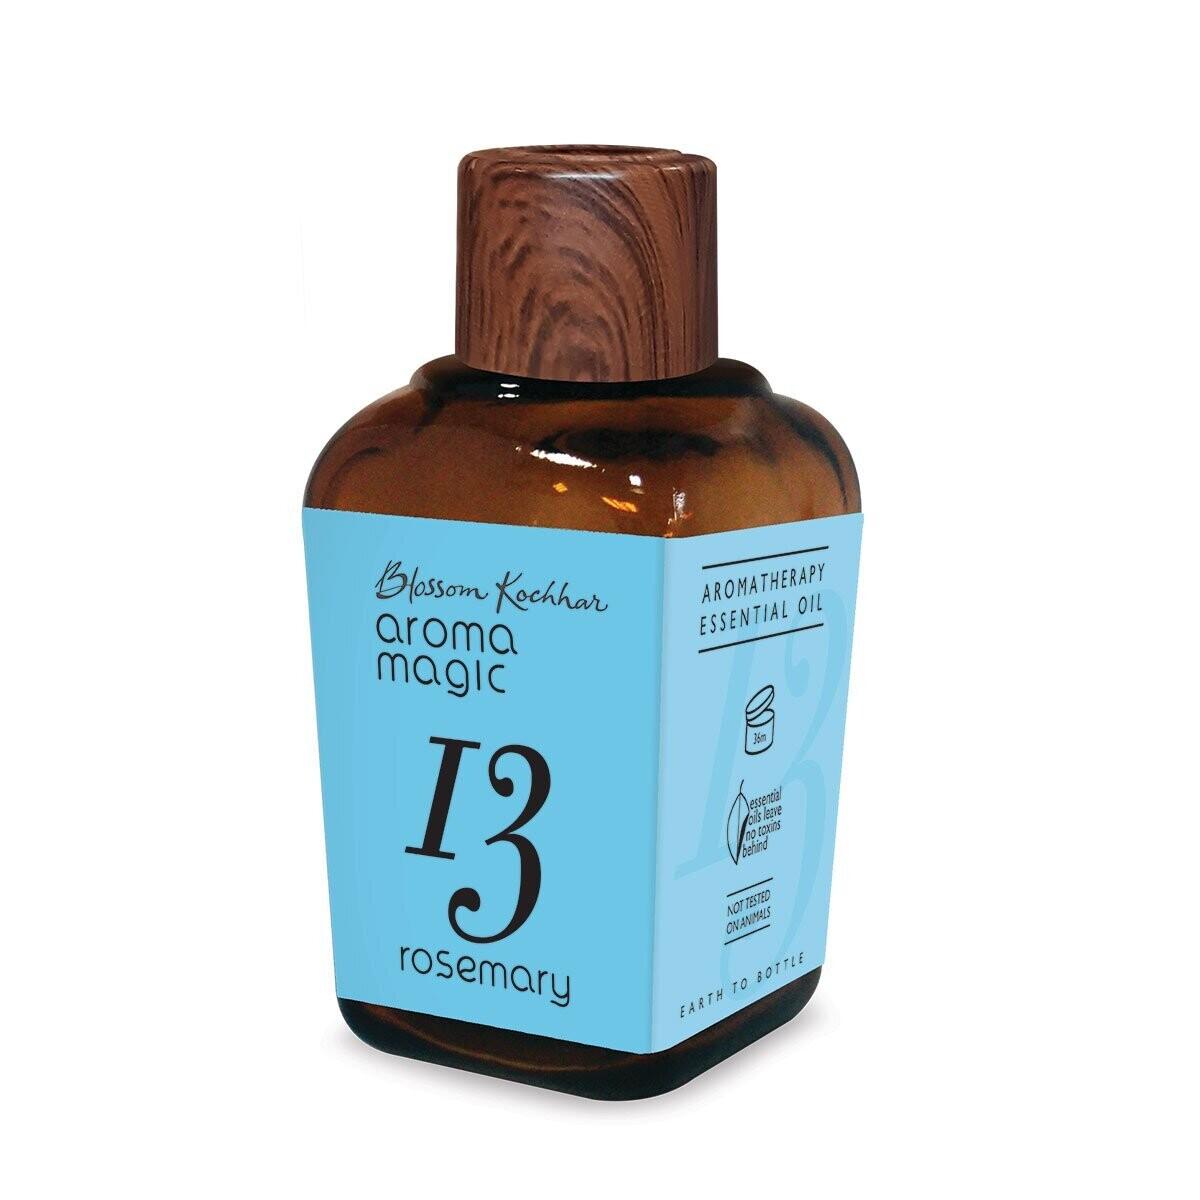 Aroma Magic 13 Rosemary Oil 20 Ml